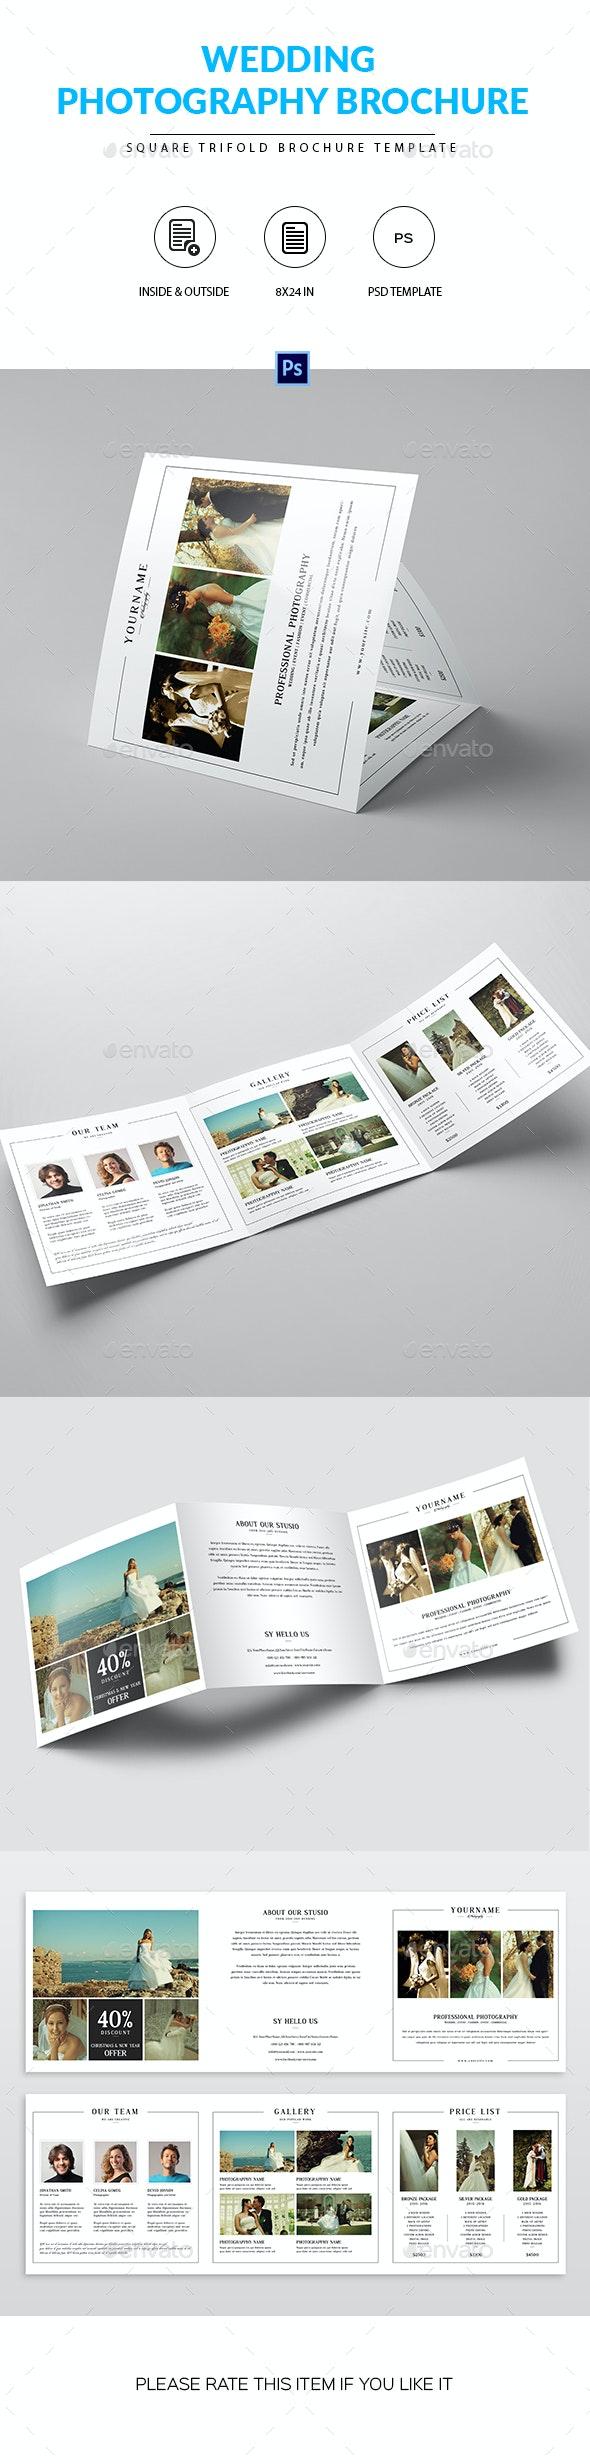 Square Trifold Brochure for Wedding Photographer - Portfolio Brochures